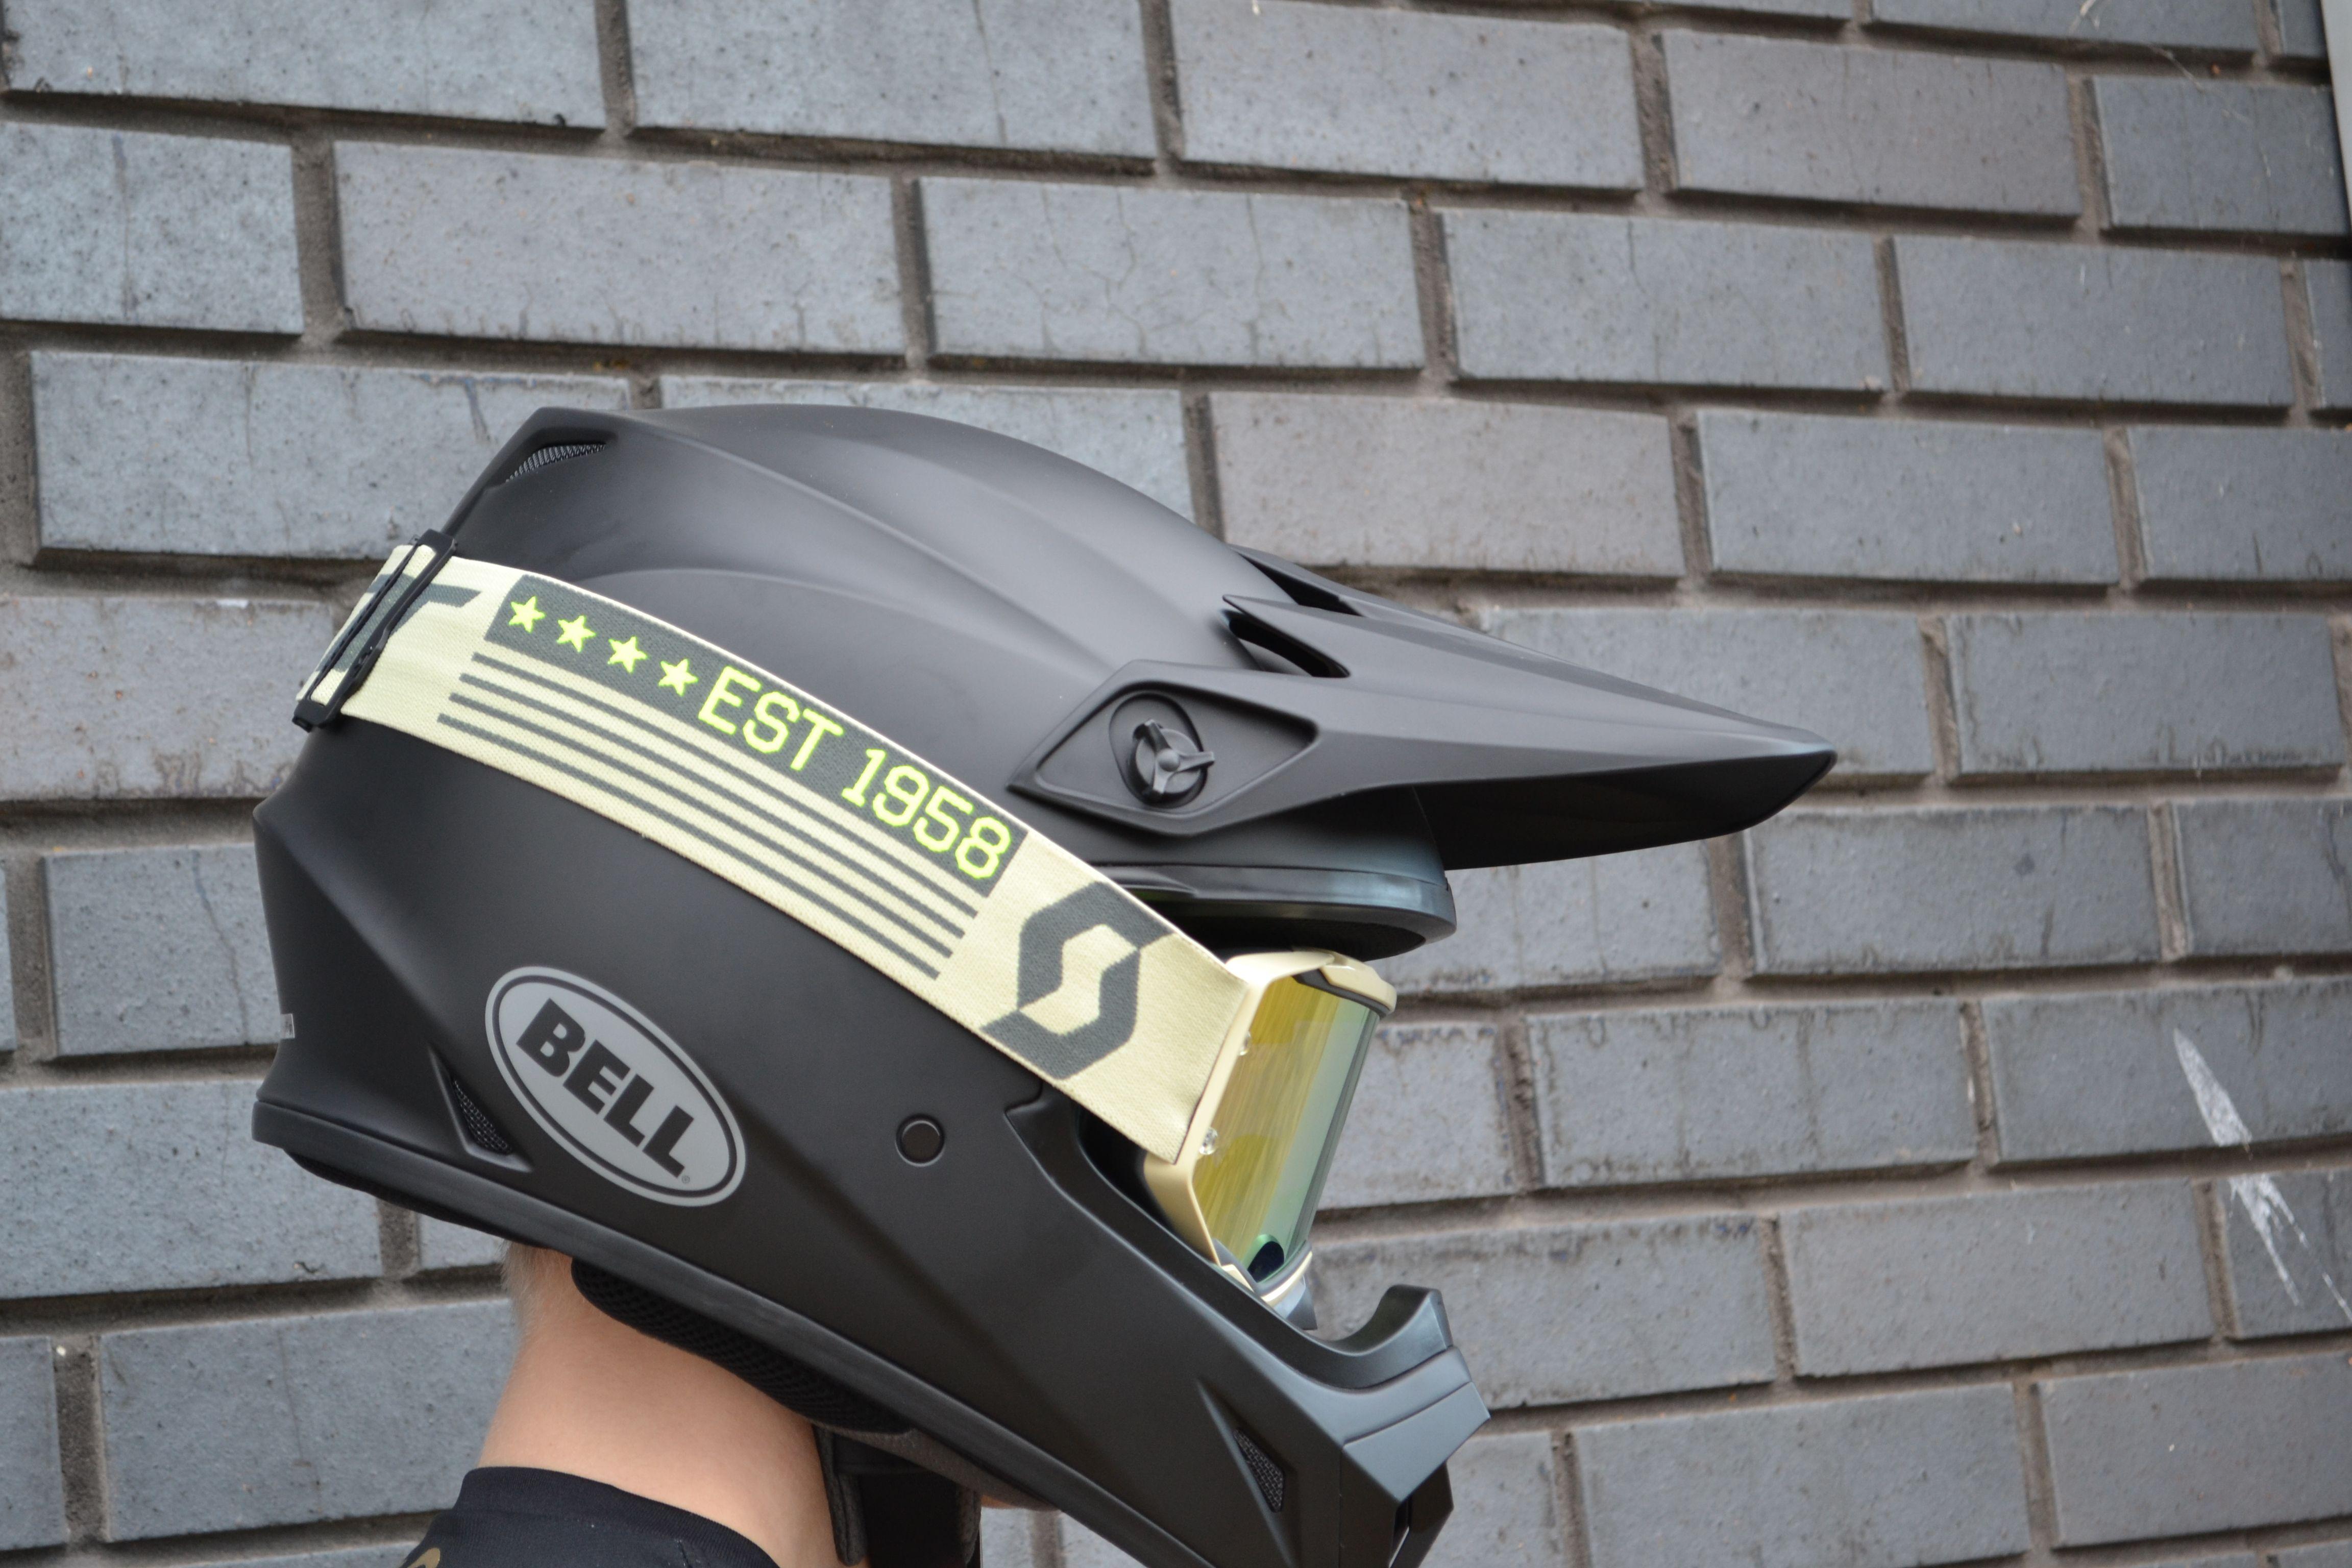 c101dbd8 Motocross Goggles, Bicycle Helmet, Riding Helmets, Chrome, Cycling Helmet